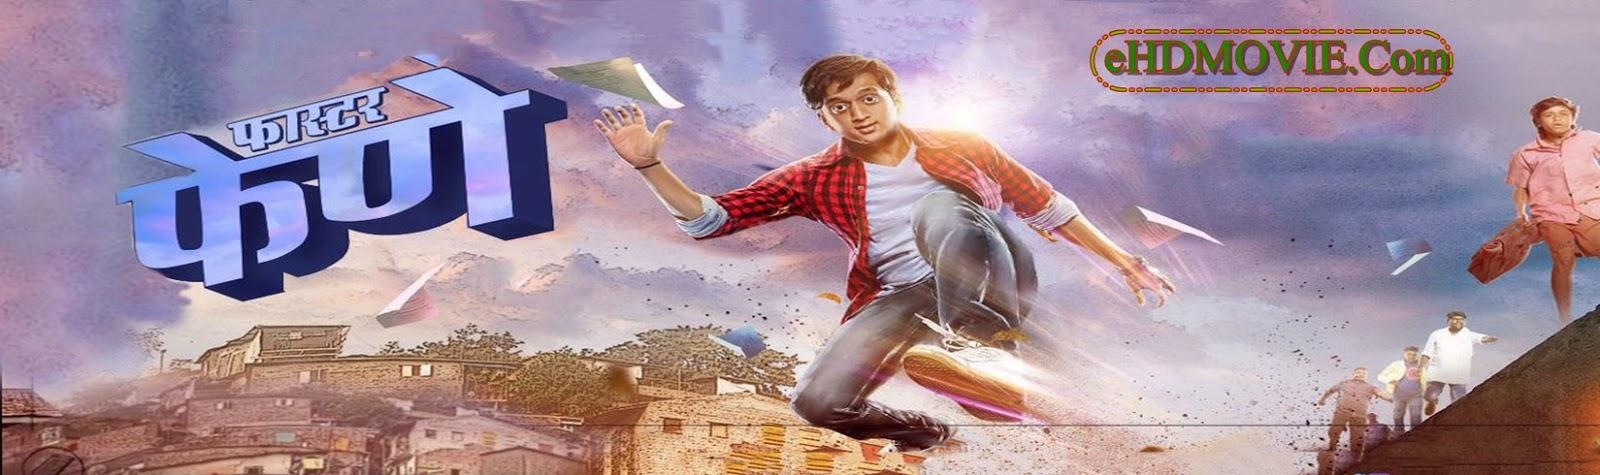 Faster Fene 2017 Full Movie Marathi 720p - 480p ORG BRRip 350MB - 900MB ESubs Free Download